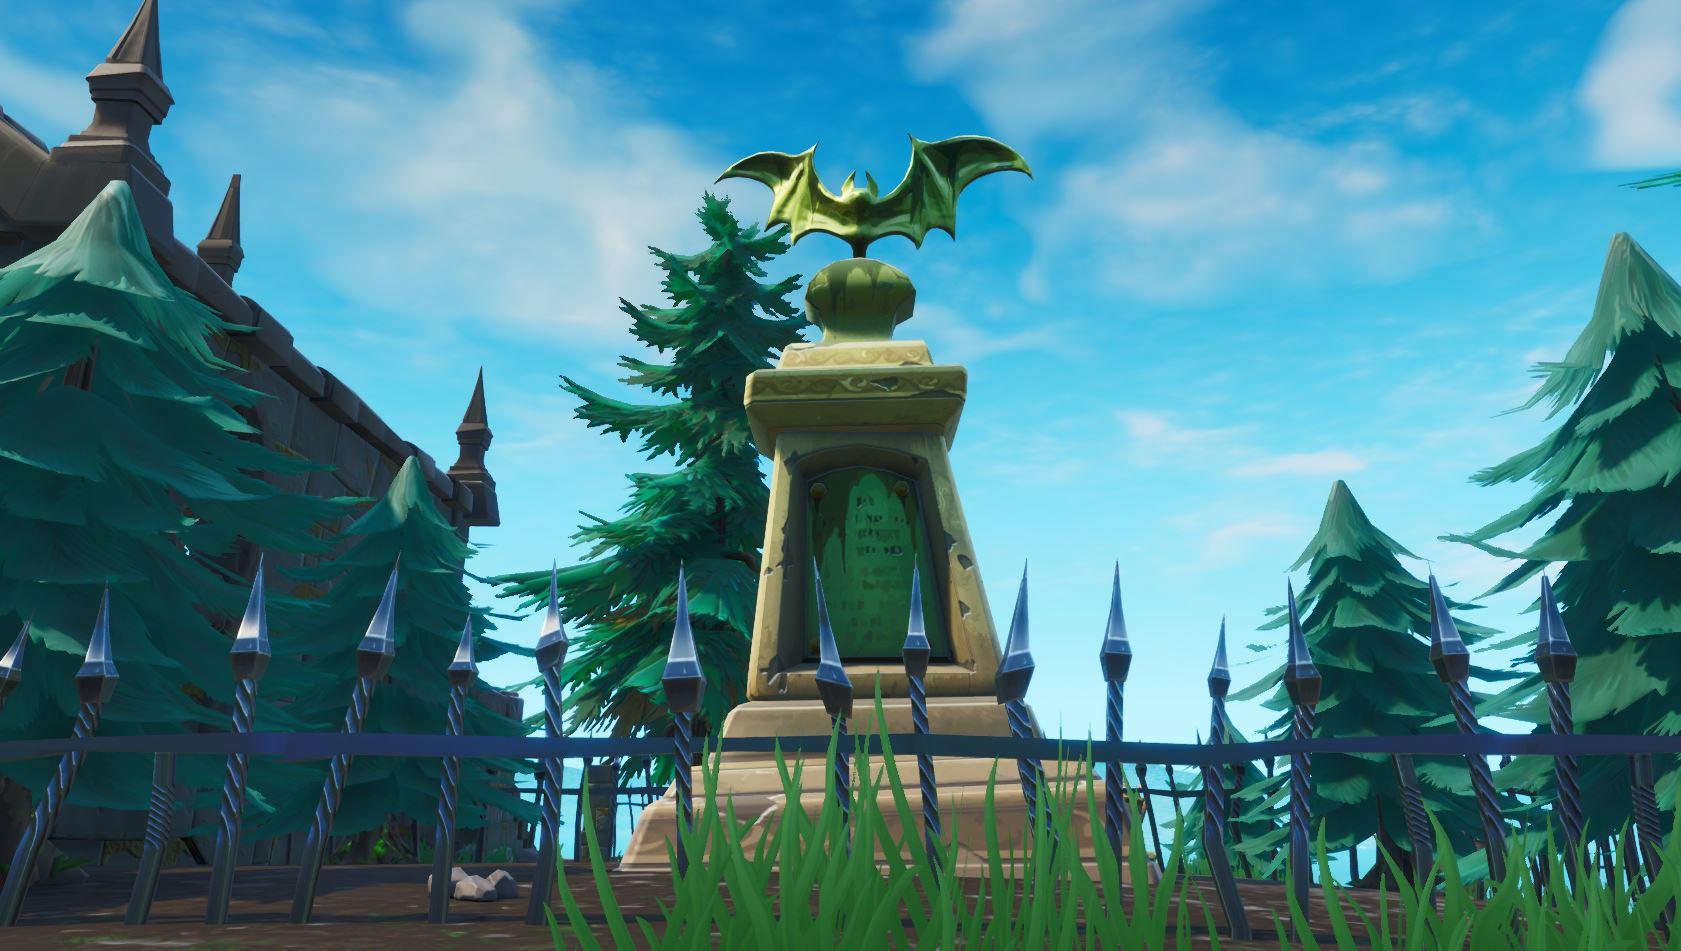 Fortnite Bat Statue